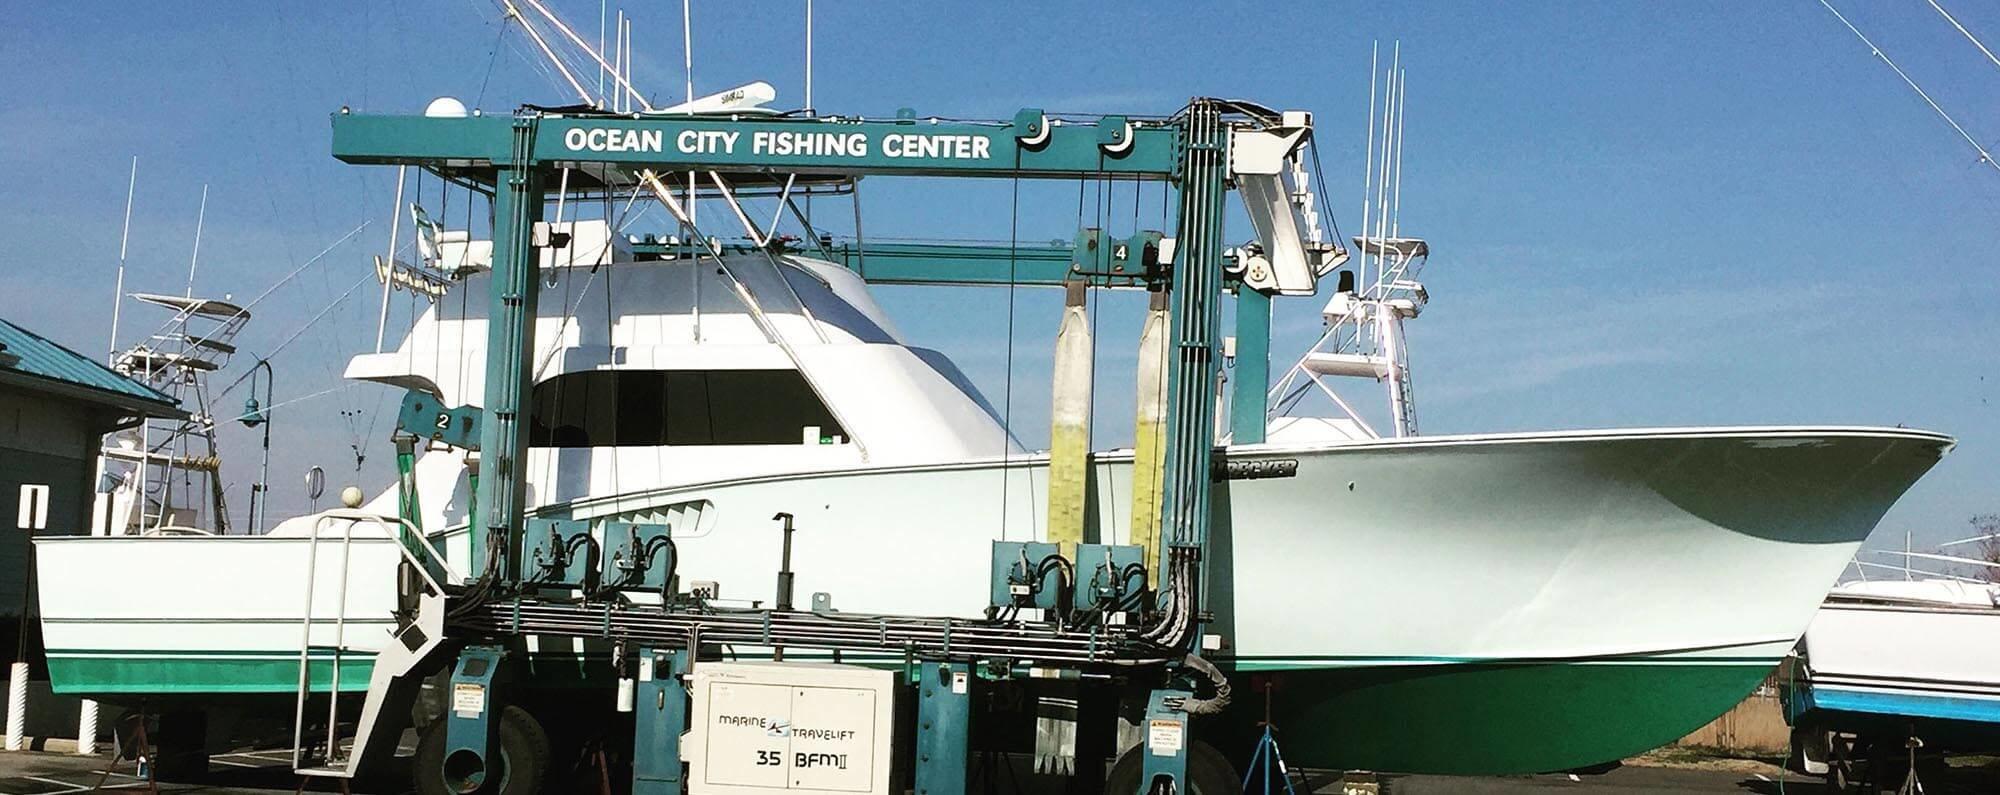 Ocean city fishing center marina ocean city md for Ocean city maryland fishing